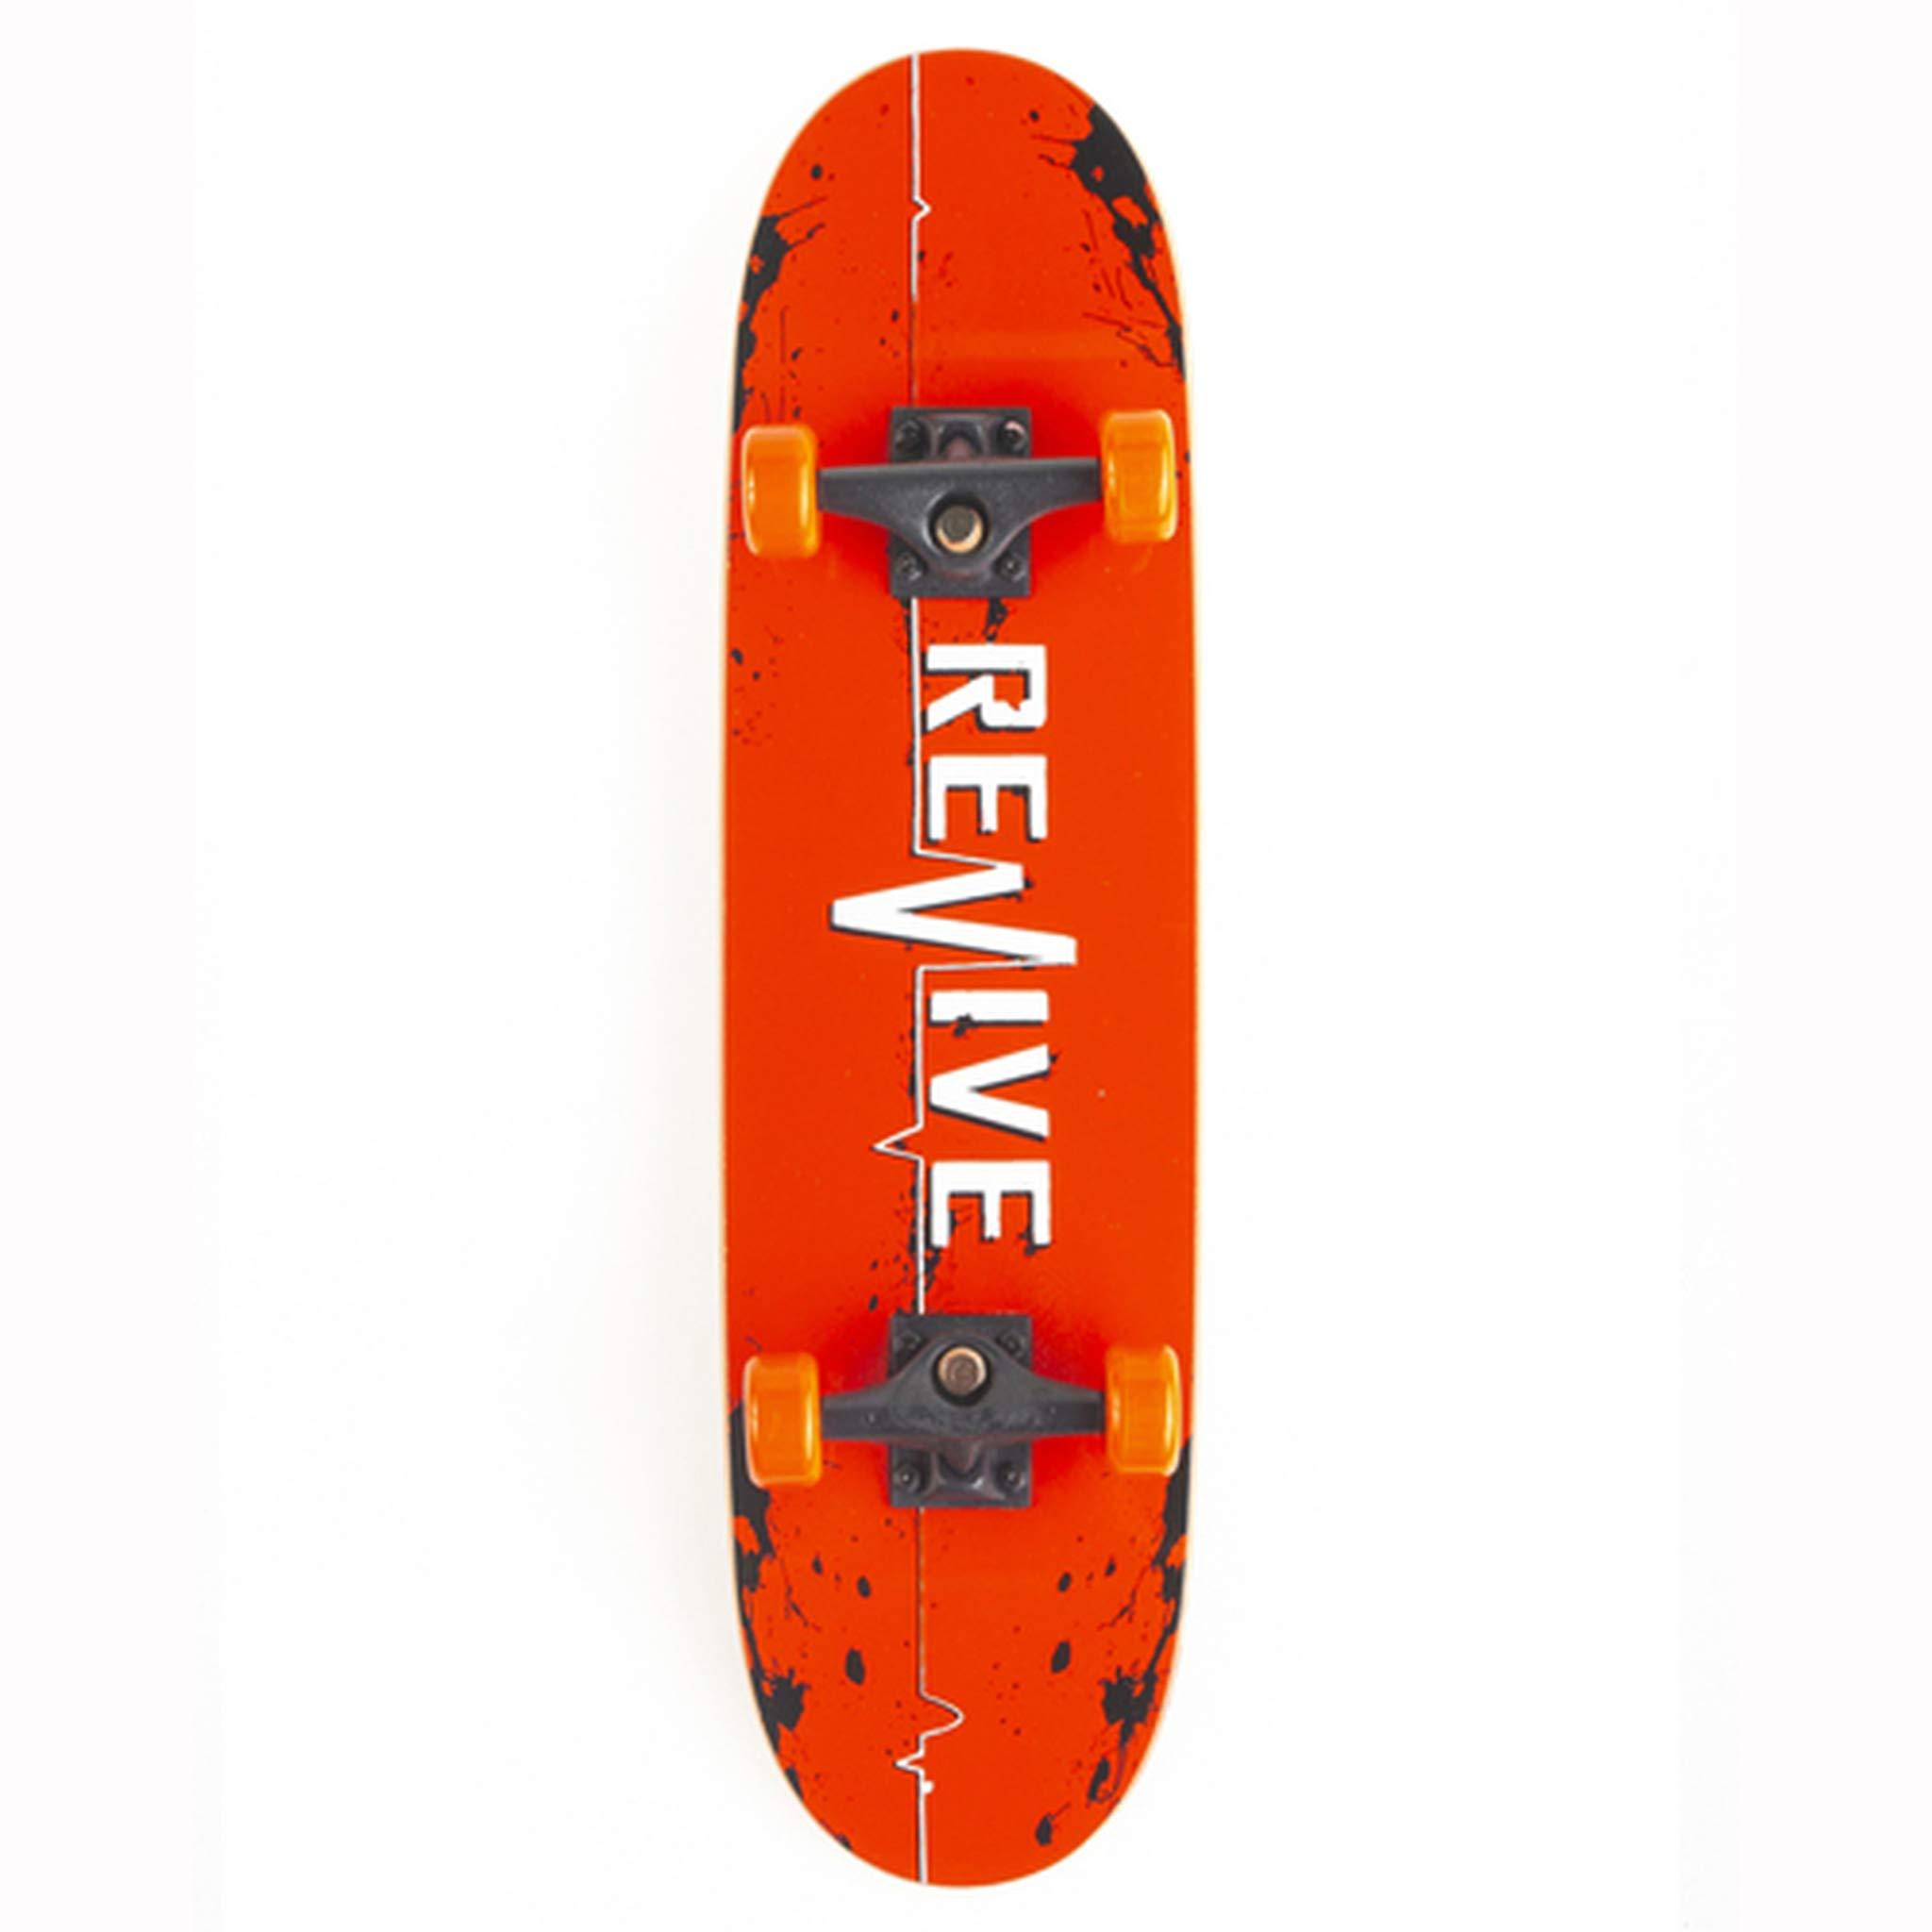 Revive Handskate Handboard (Red Lifeline) by Revive Skateboard